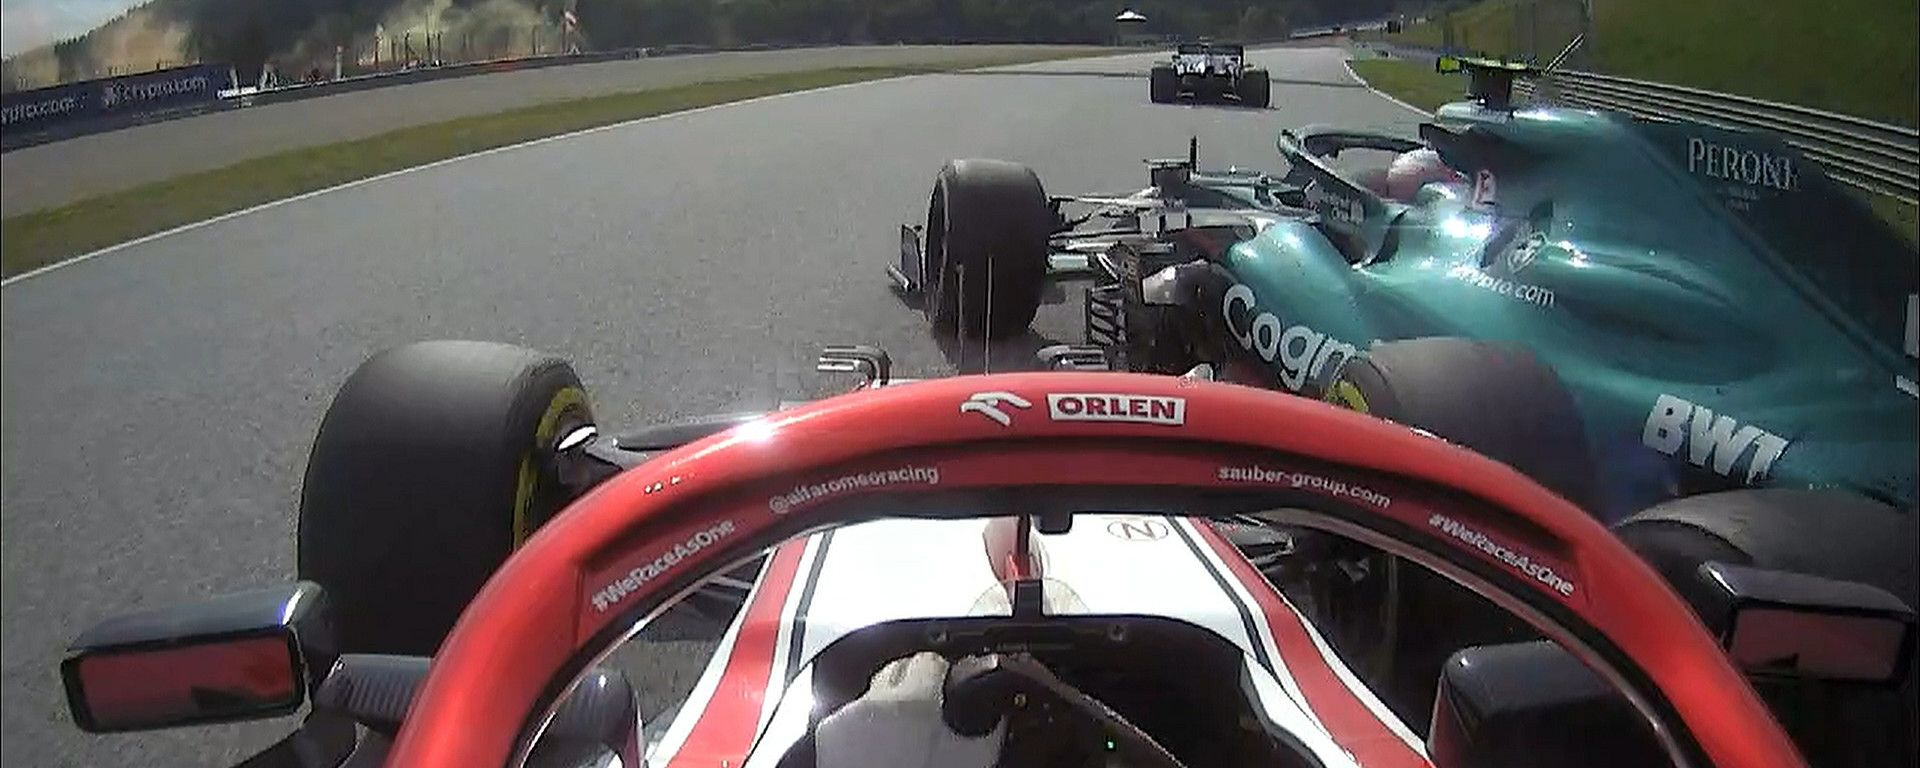 F1, GP Austria 2021: il contatto tra Kimi Raikkonen e Sebastian Vettel